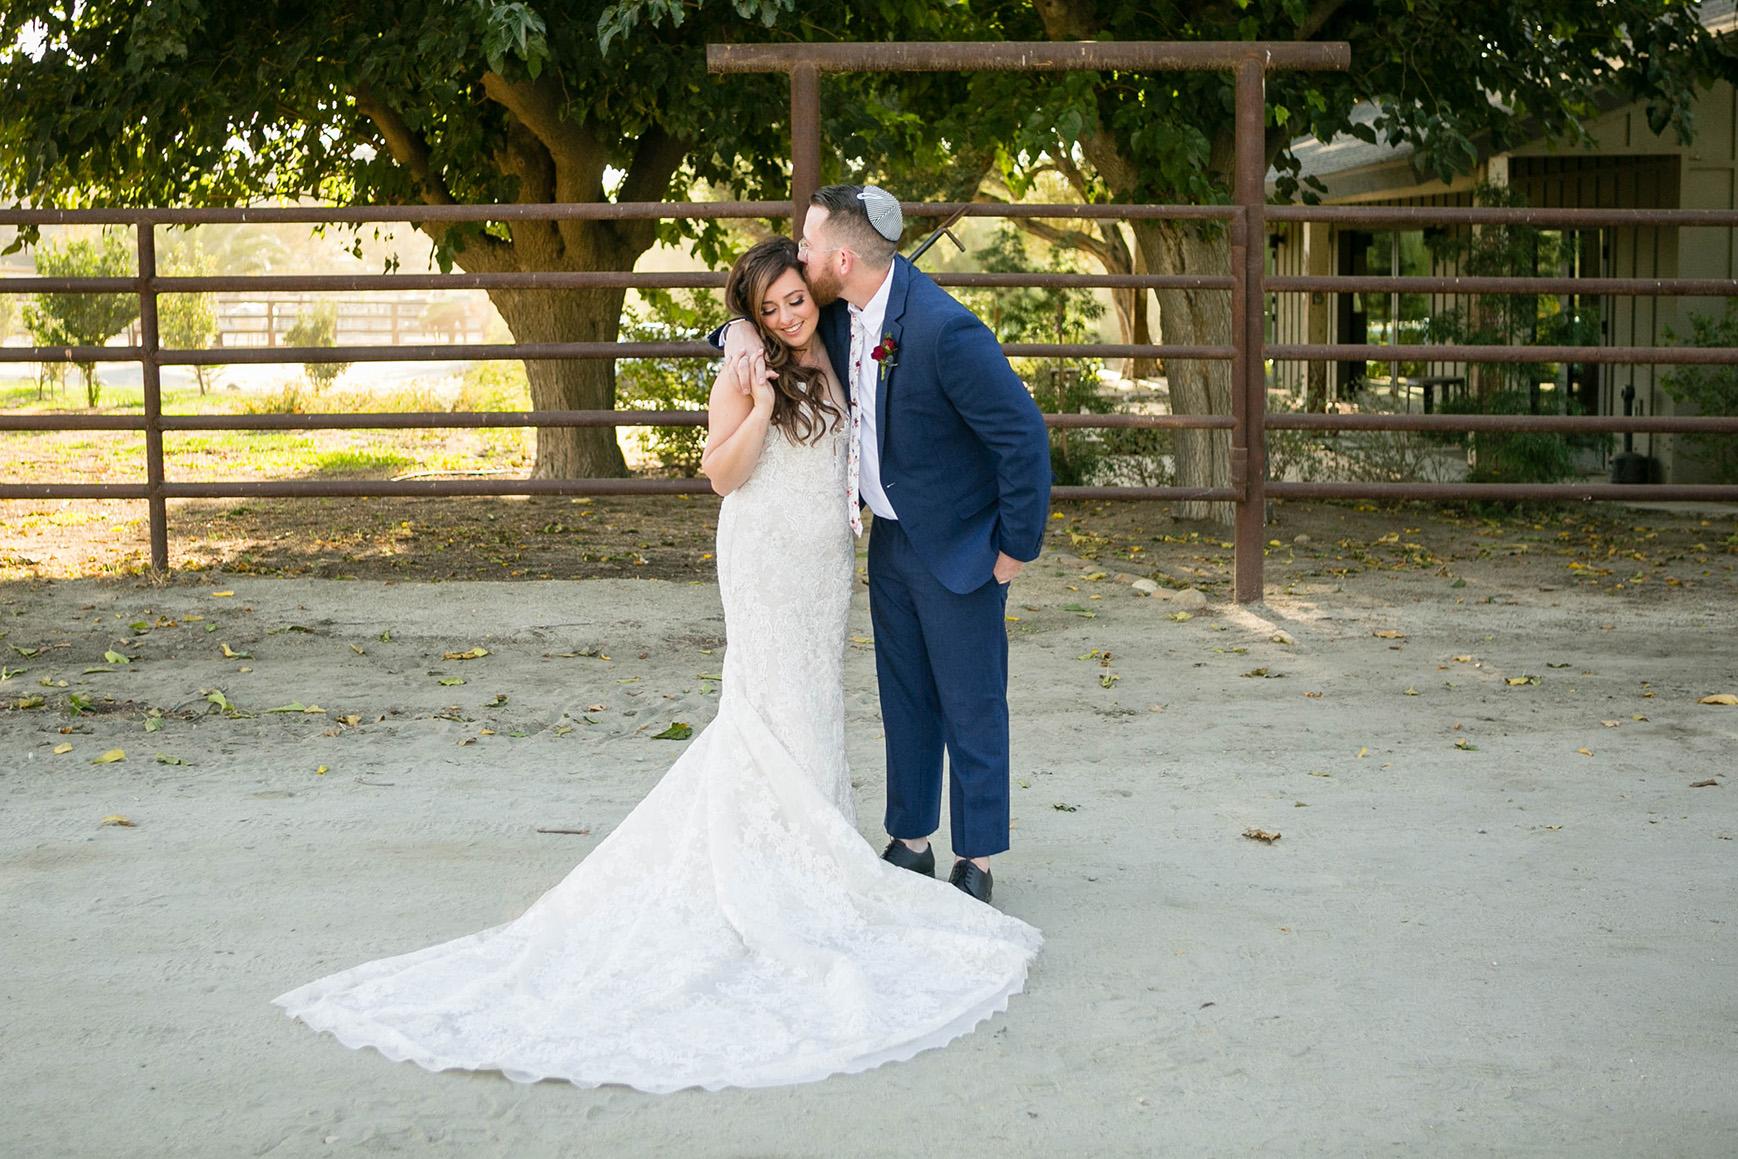 Happy Newlyweds - Galway Downs - Temecula, California - Riverside County - Wedgewood Weddings